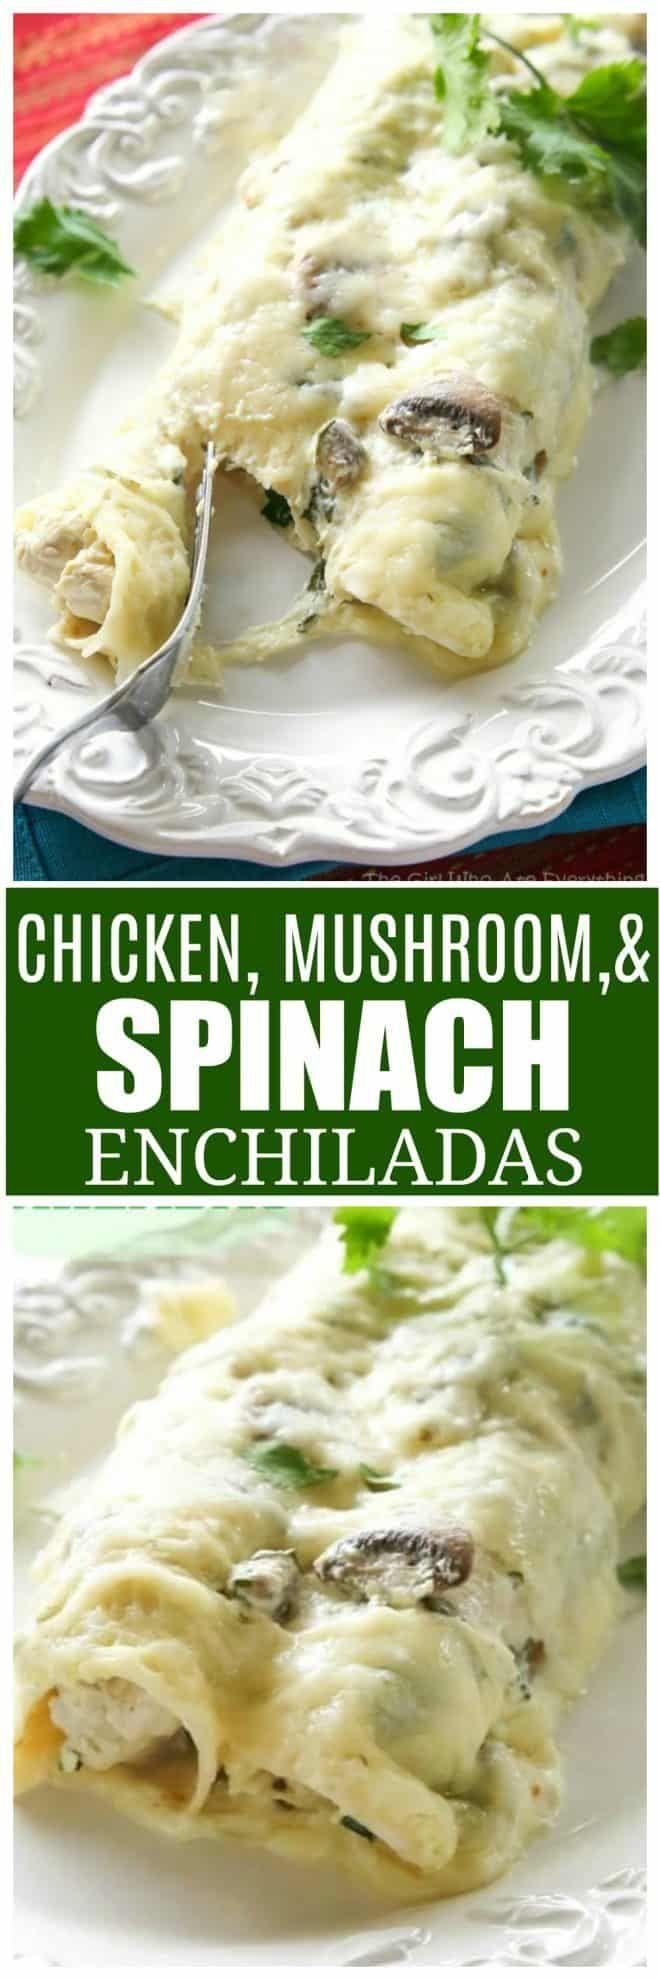 Chicken Mushroom And Spinach Enchiladas Recipe Food Recipes Mexican Food Recipes Cooking Recipes